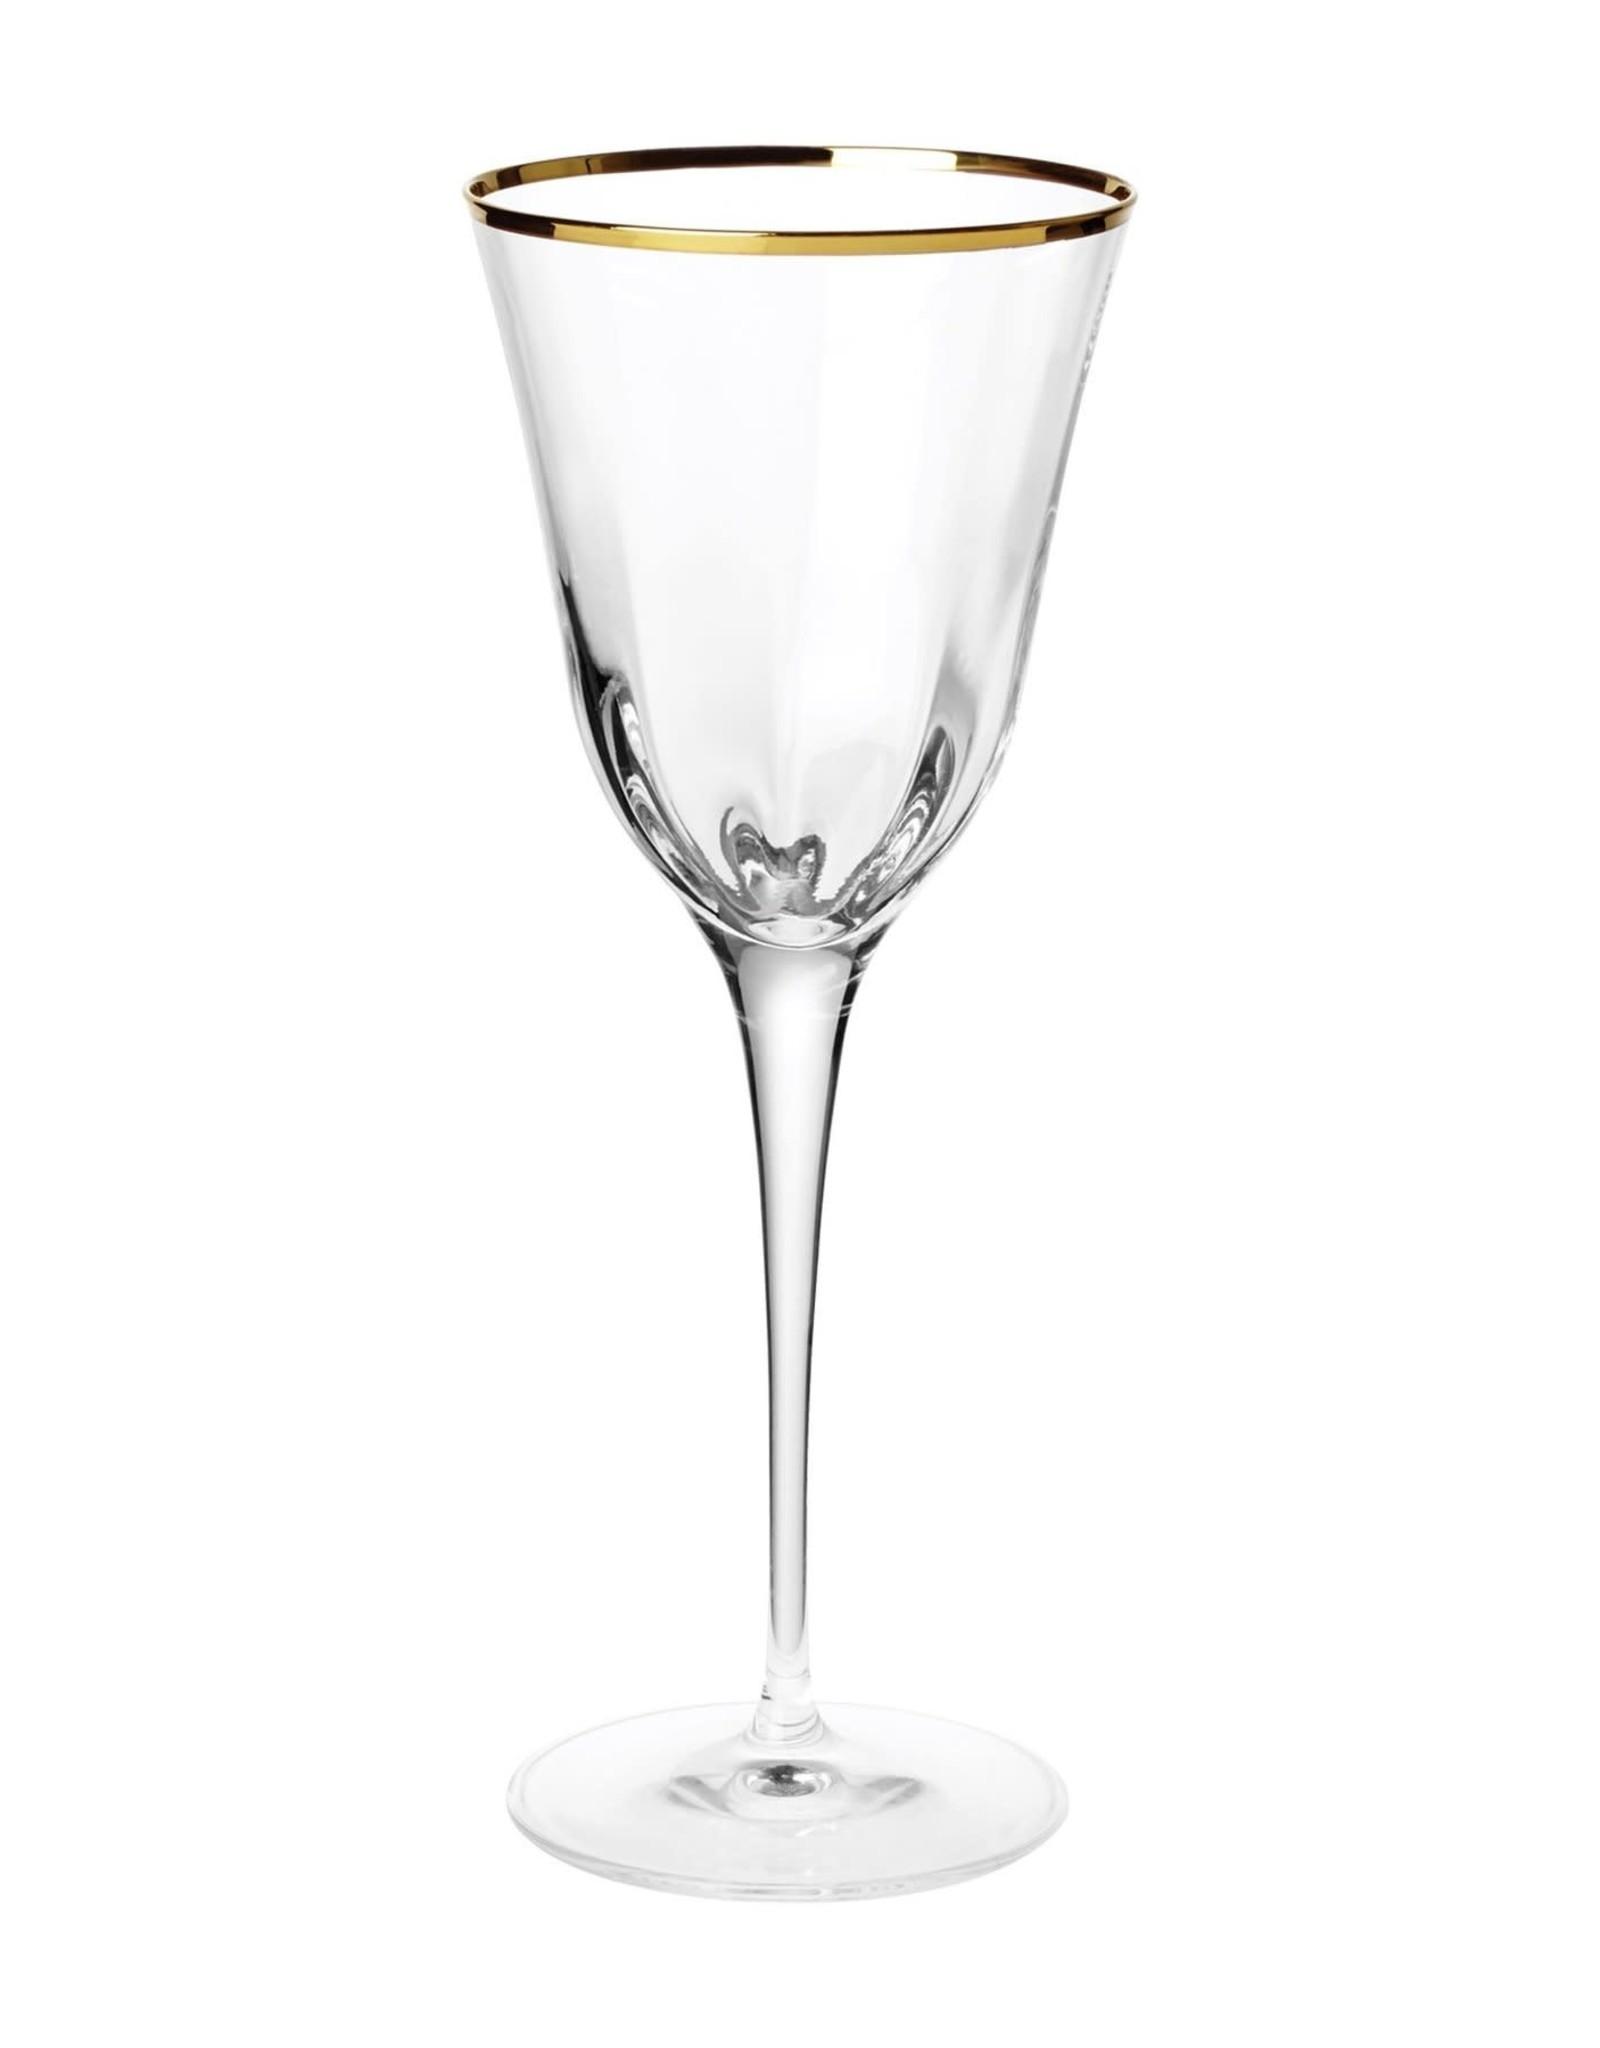 Vietri Optical Gold Water Glass